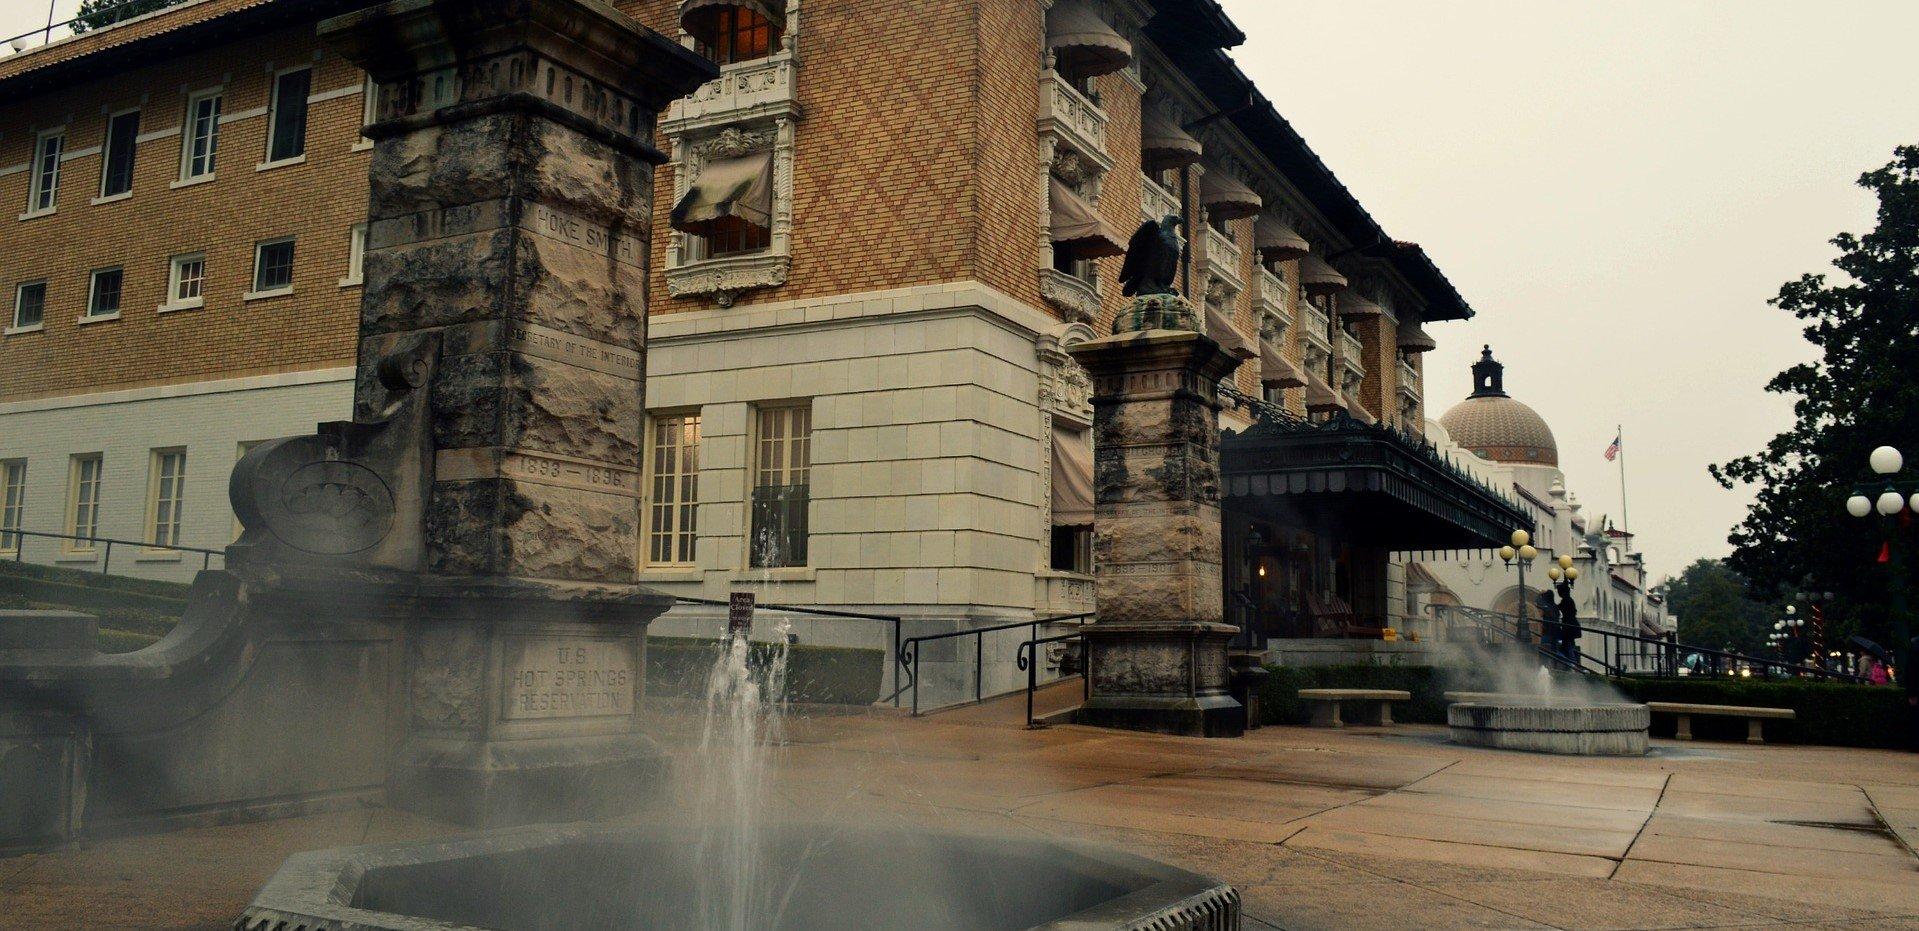 Hot Steam Bathhouse in Arkansas - VeteranCarDonations.org